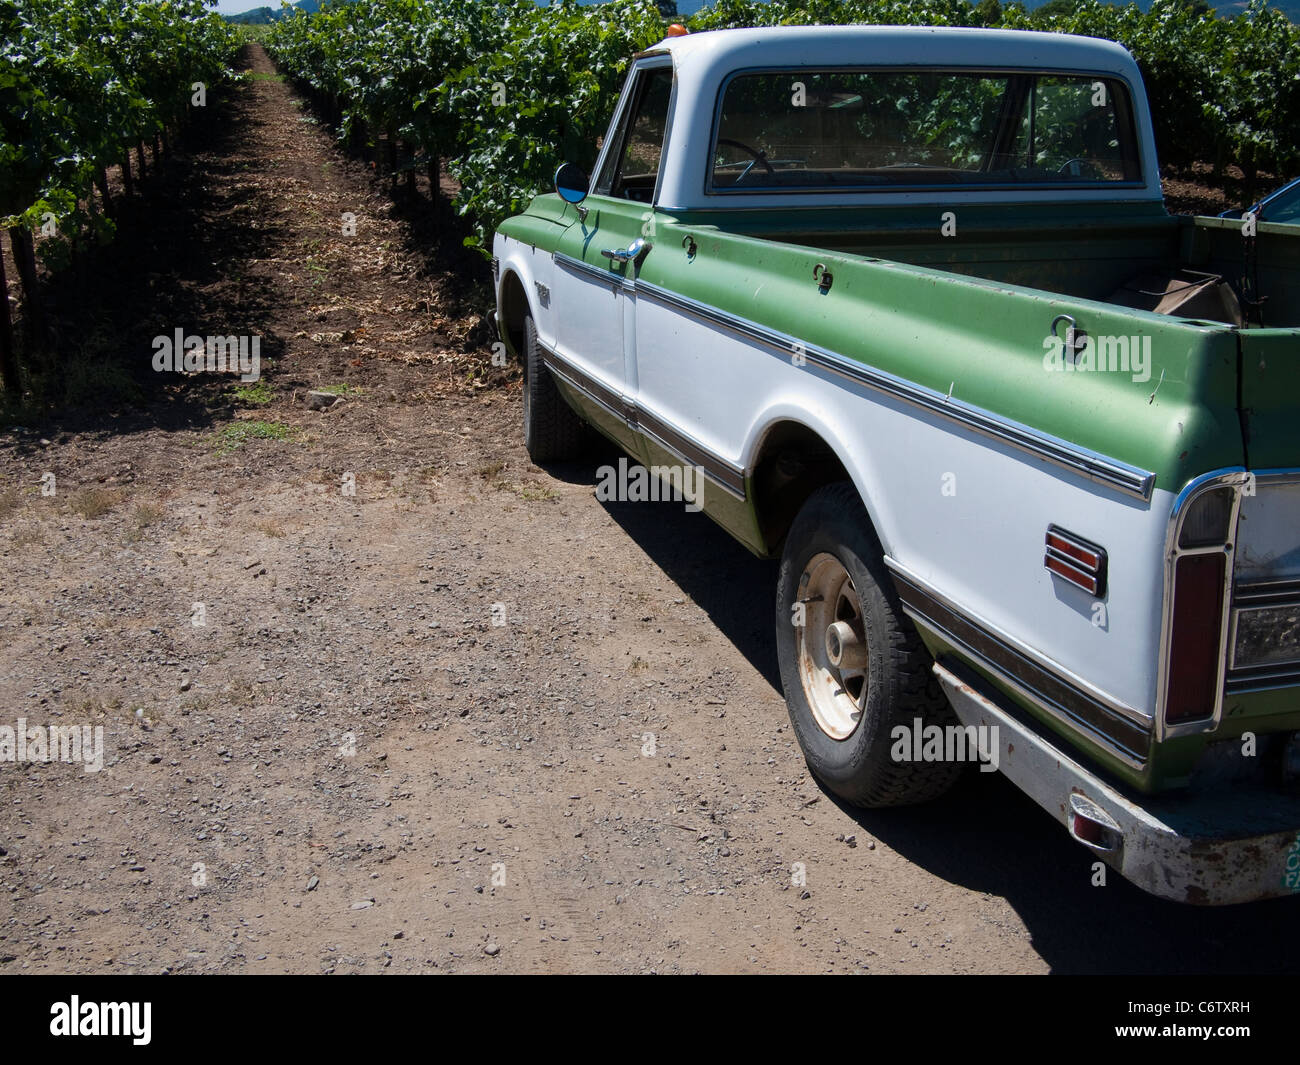 Old Chevy Pickup, Napa Valley, California Stock Photo: 38656565 - Alamy